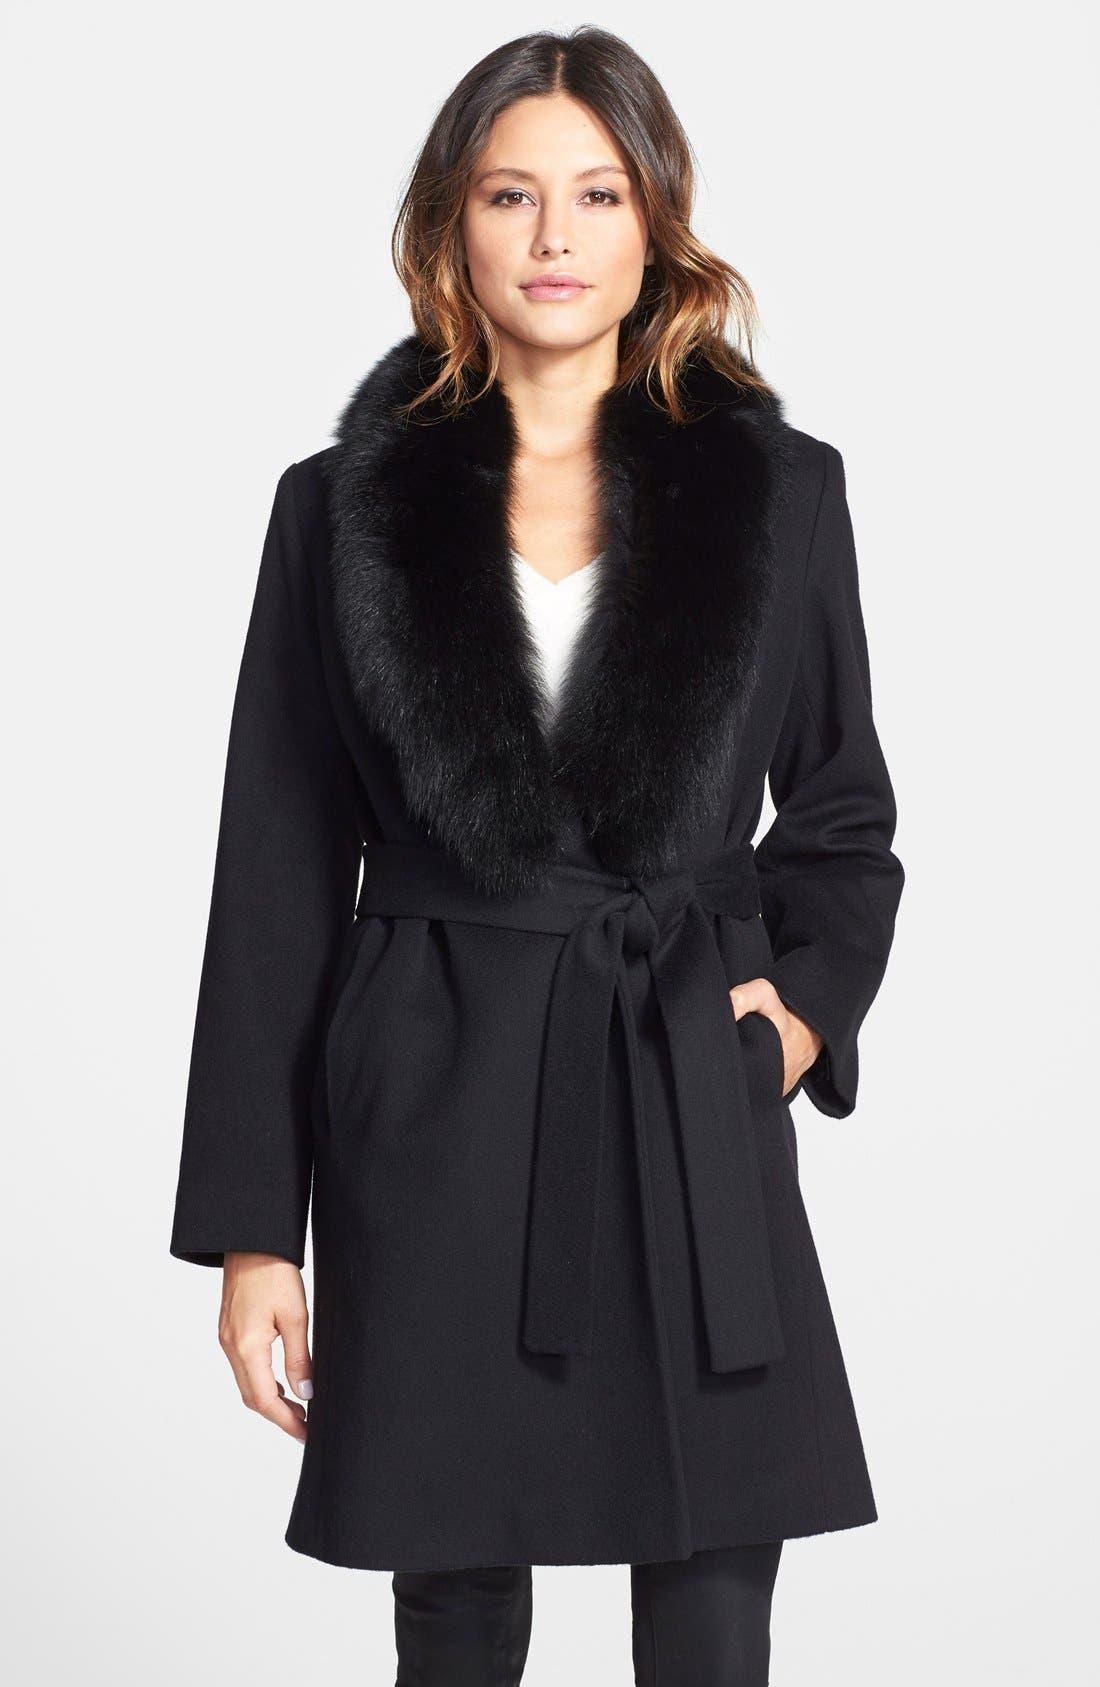 Main Image - Fleurette Wool Wrap Coat with Genuine Fox Fur Collar